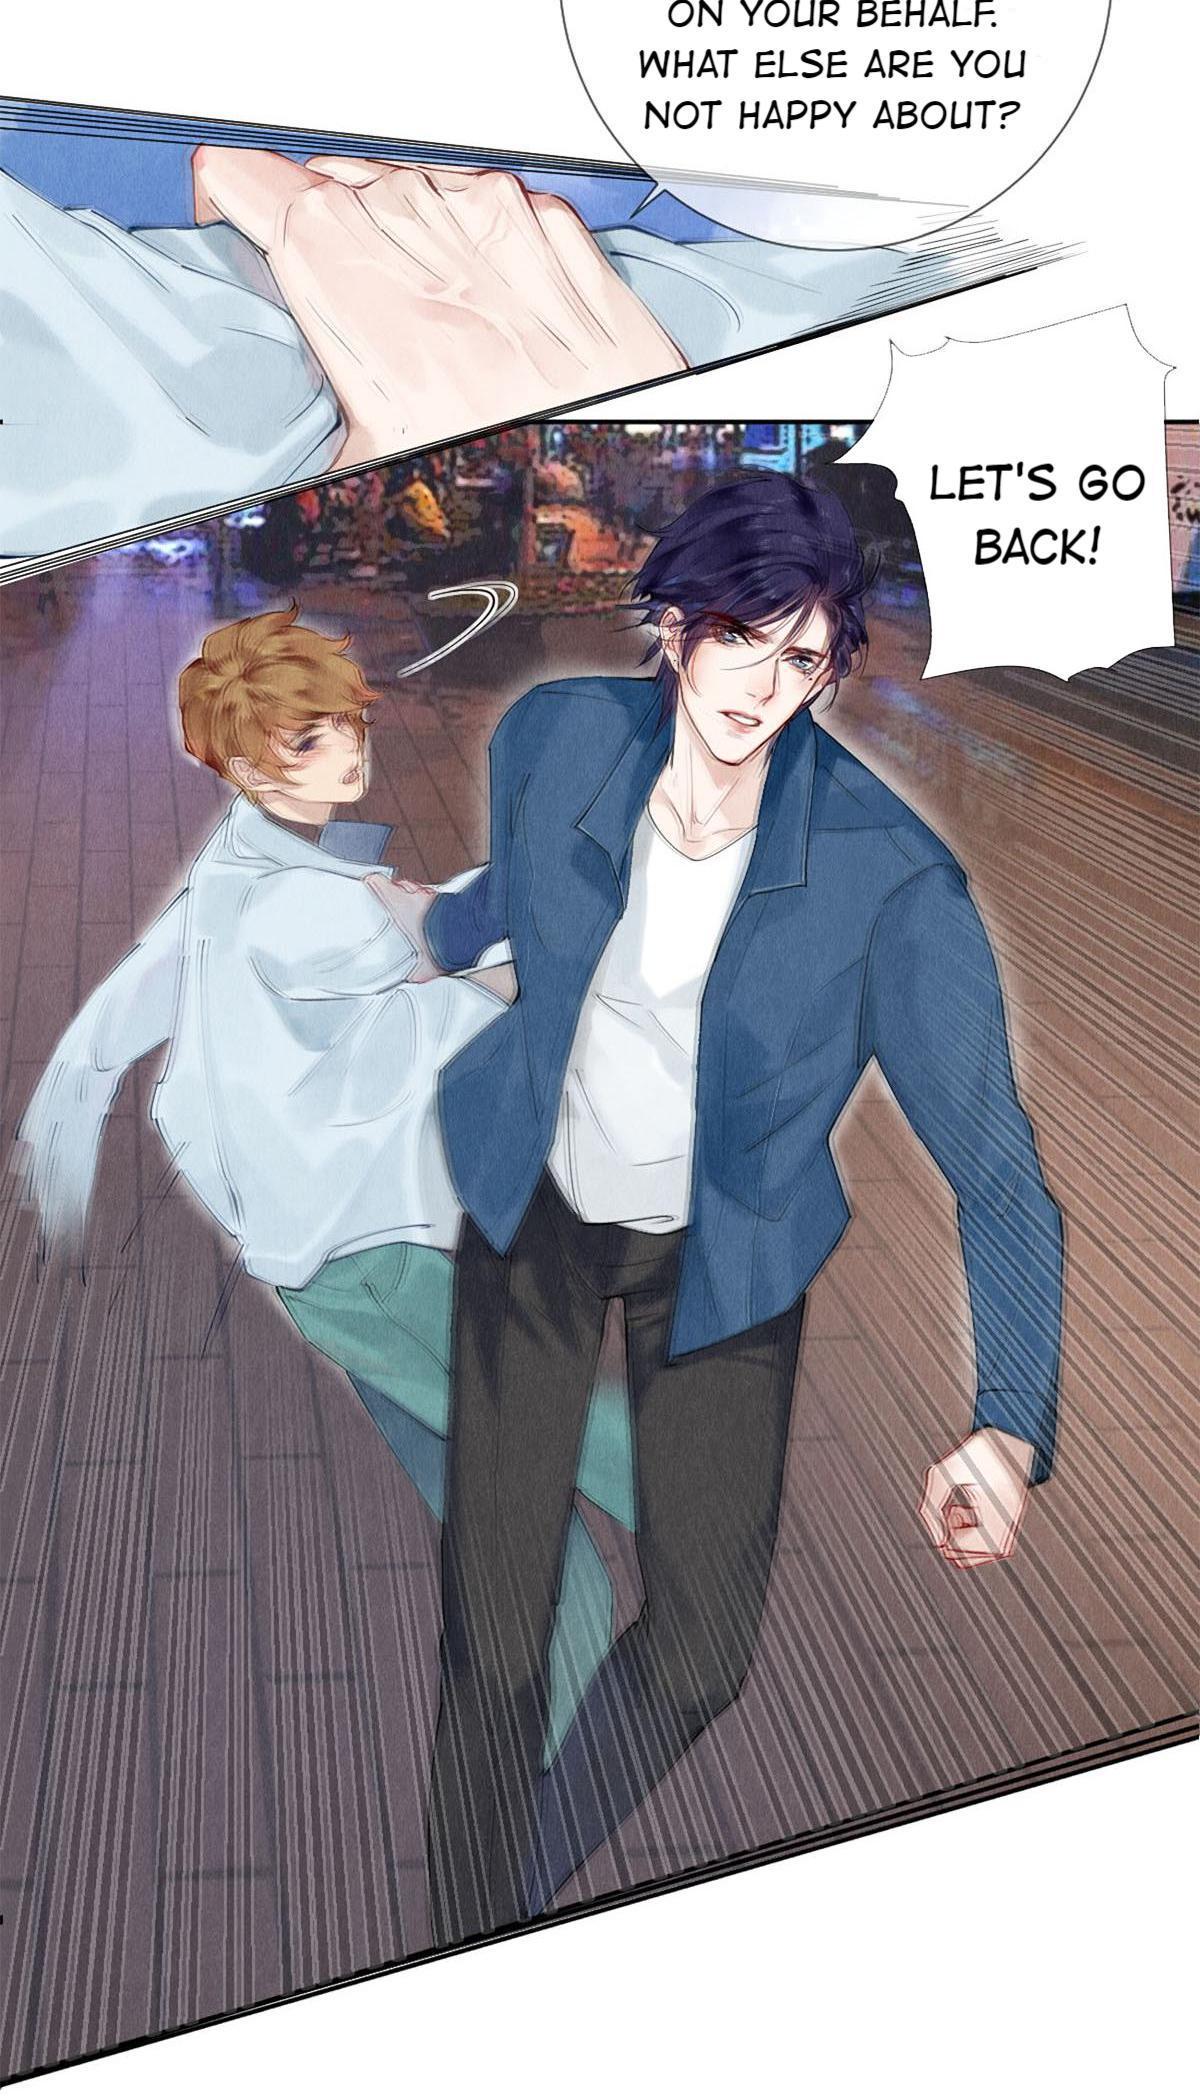 Best Actors Apartment Chapter 54: The School Belle's Golden Retriever Is Missing Part.2 page 1 - Mangakakalot